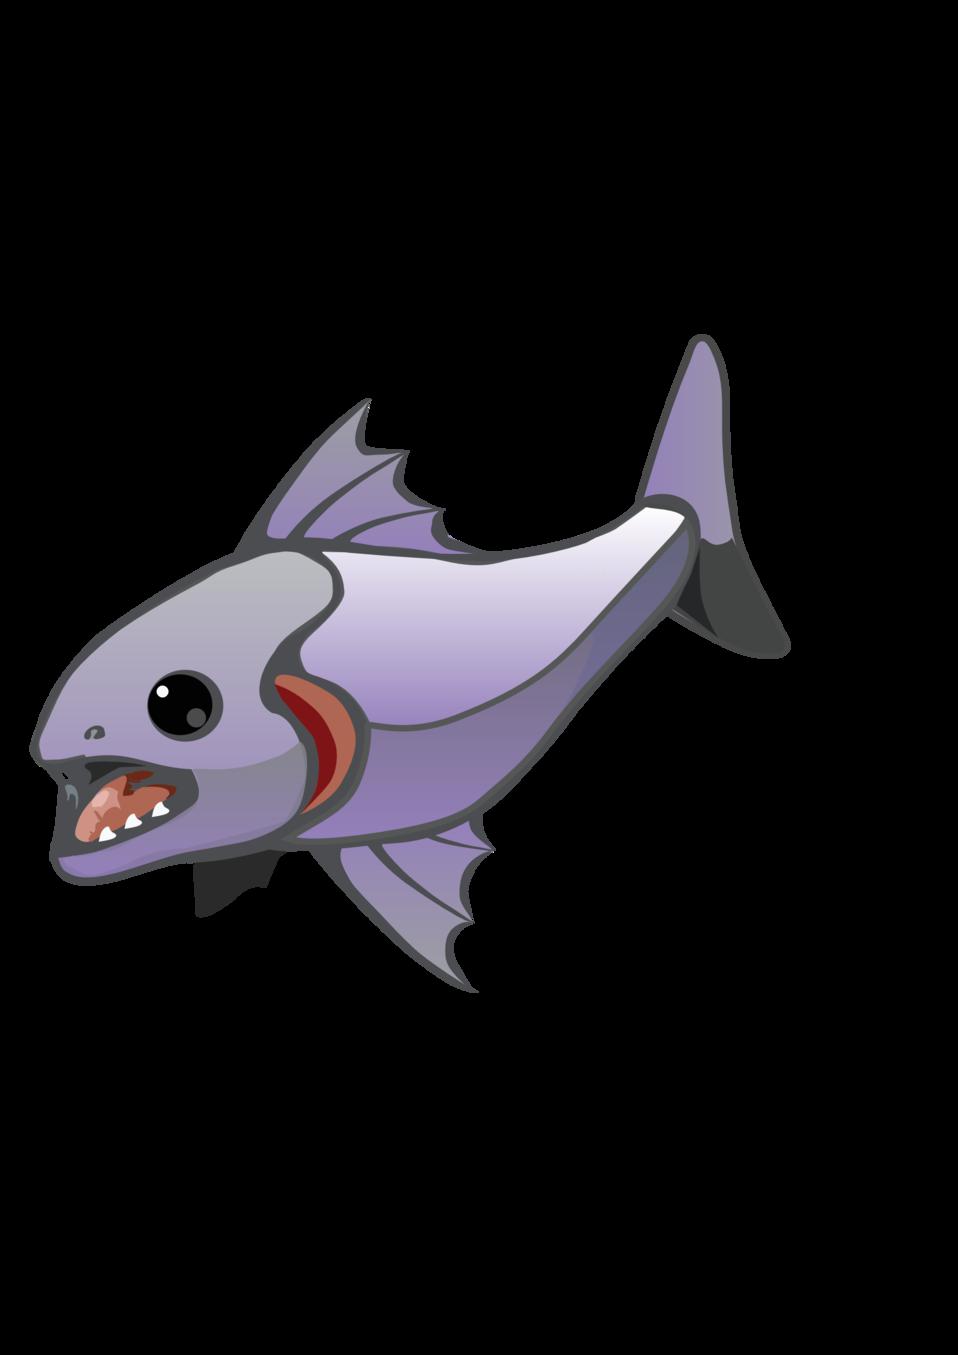 Prehistoric Looking fish